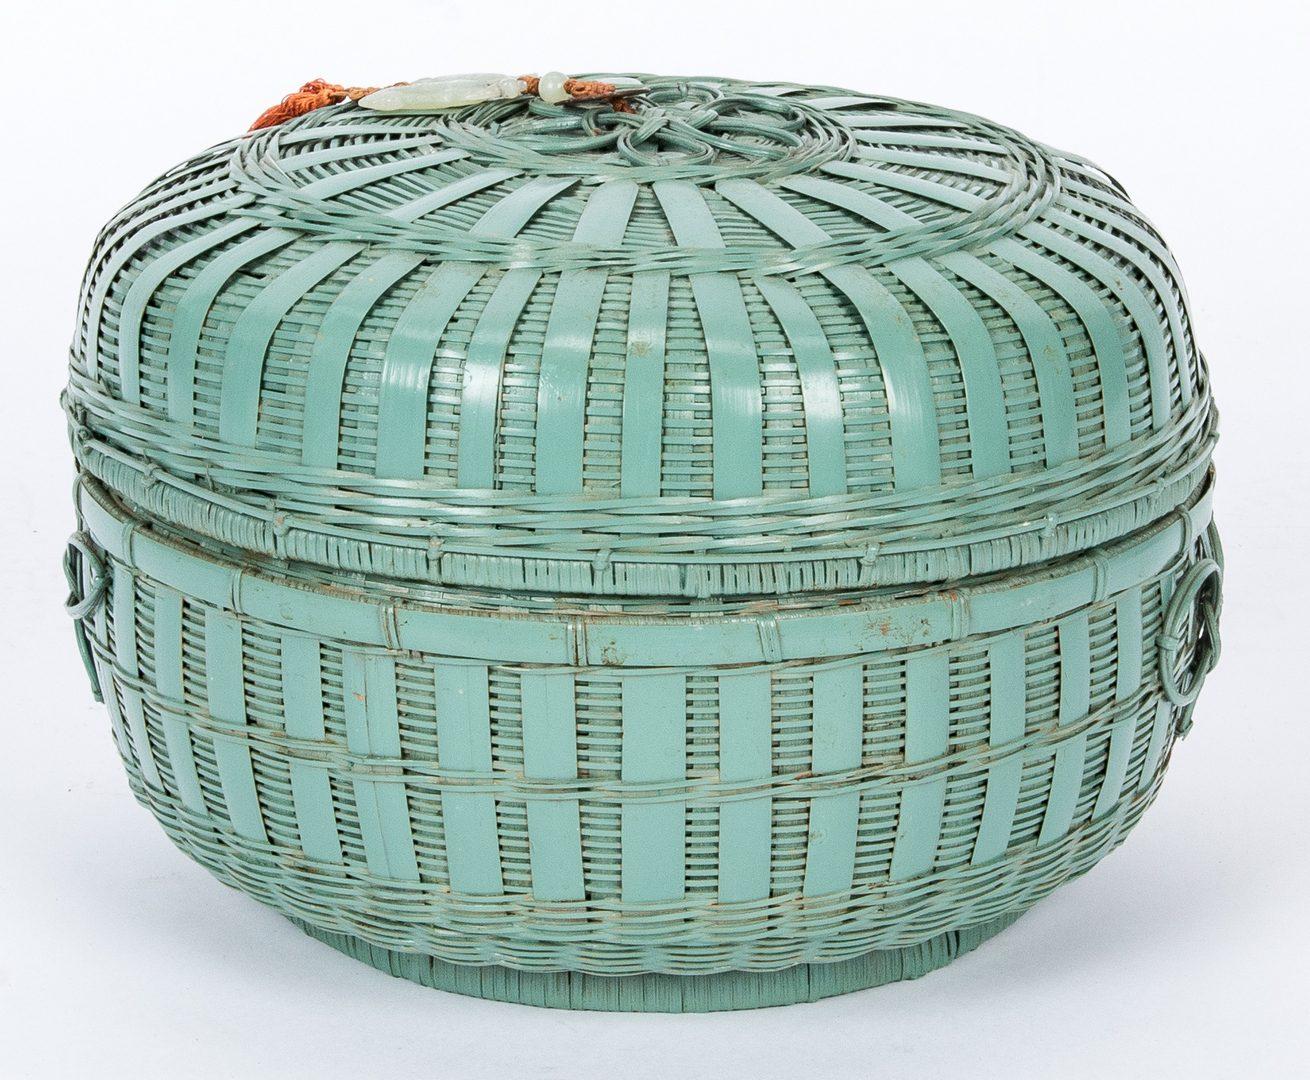 Lot 445: Chinese Storage Basket w/ White Jade & 2 Chinese Chests